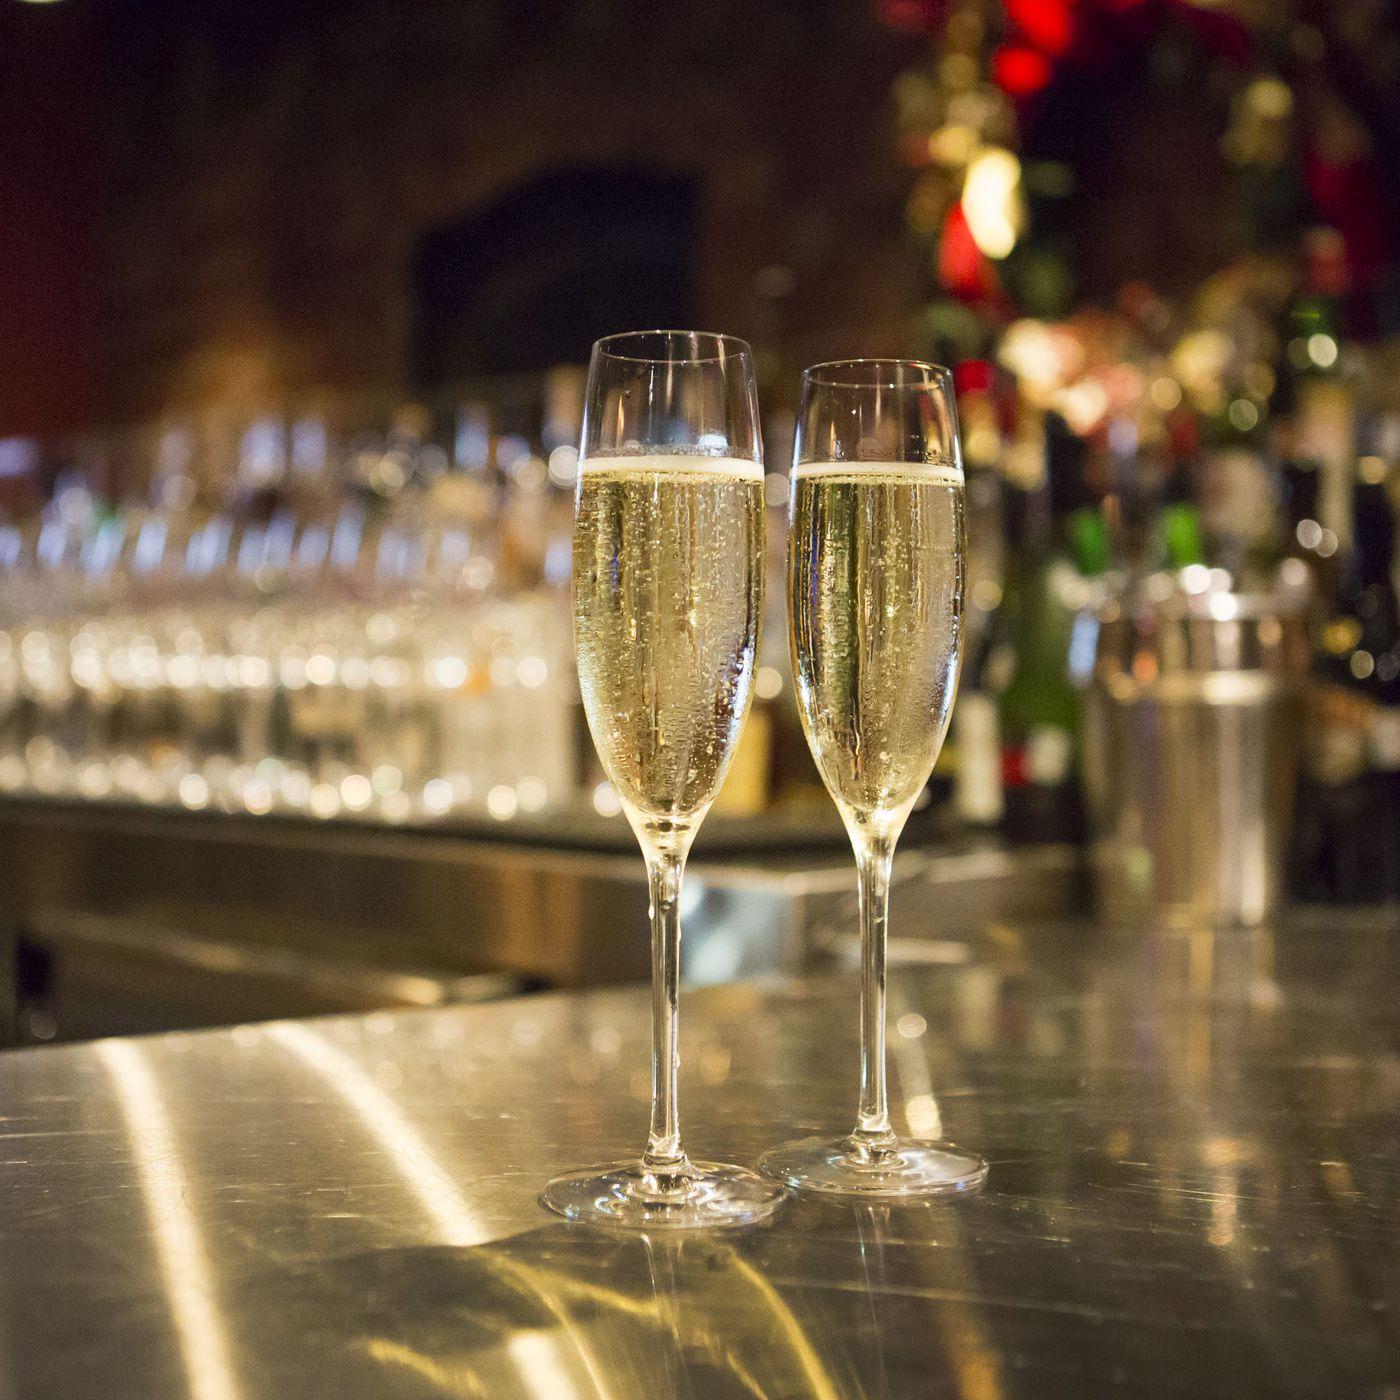 Houston Restaurants Open Christmas Eve 2020 Molinas The 17 Best Houston Restaurants Open on Christmas Eve and